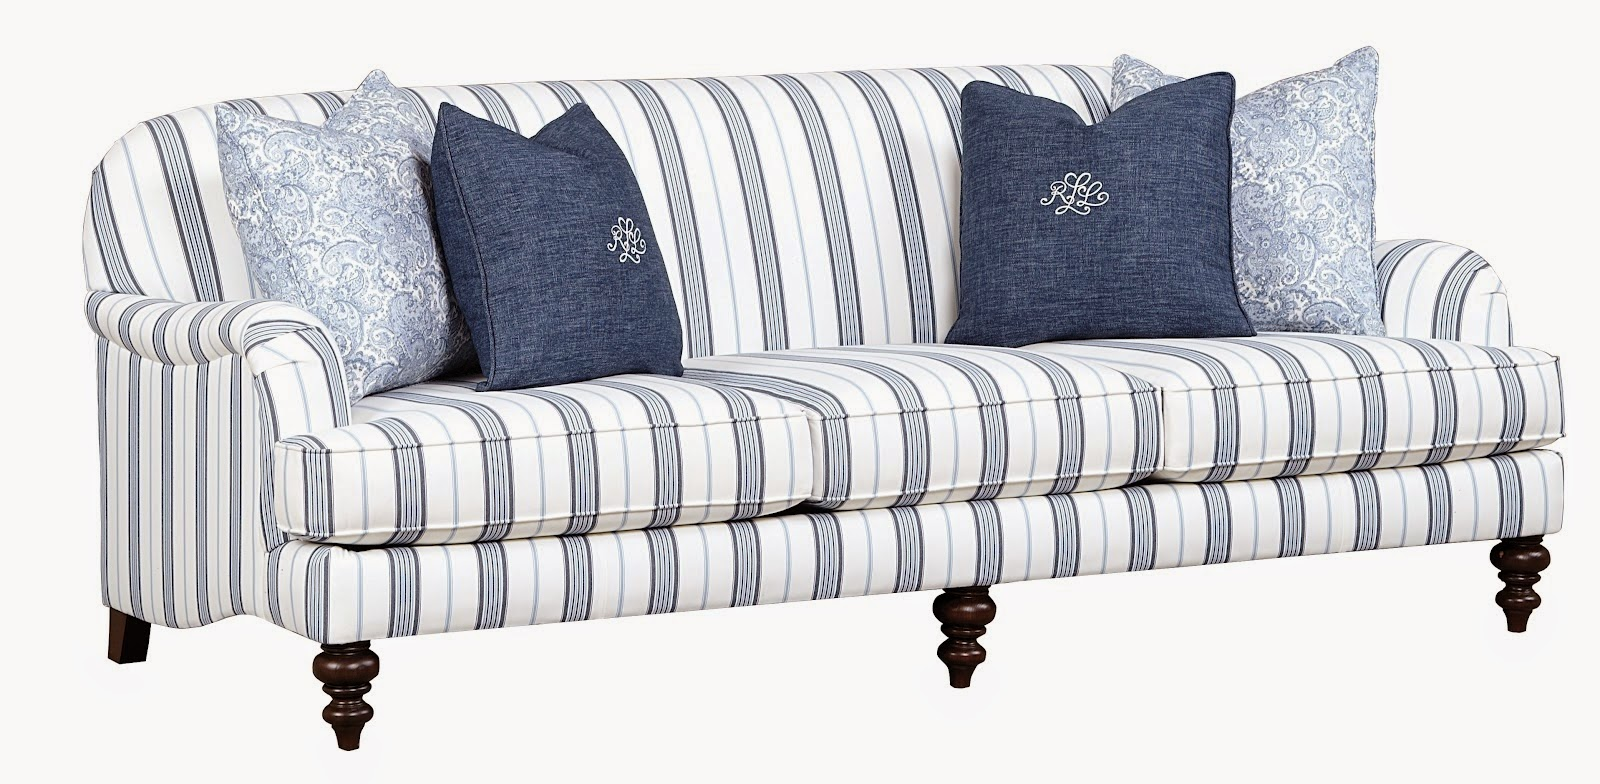 ralph lauren home chesterfield sofa coolest sofas in the world darya girina interior design coastal style